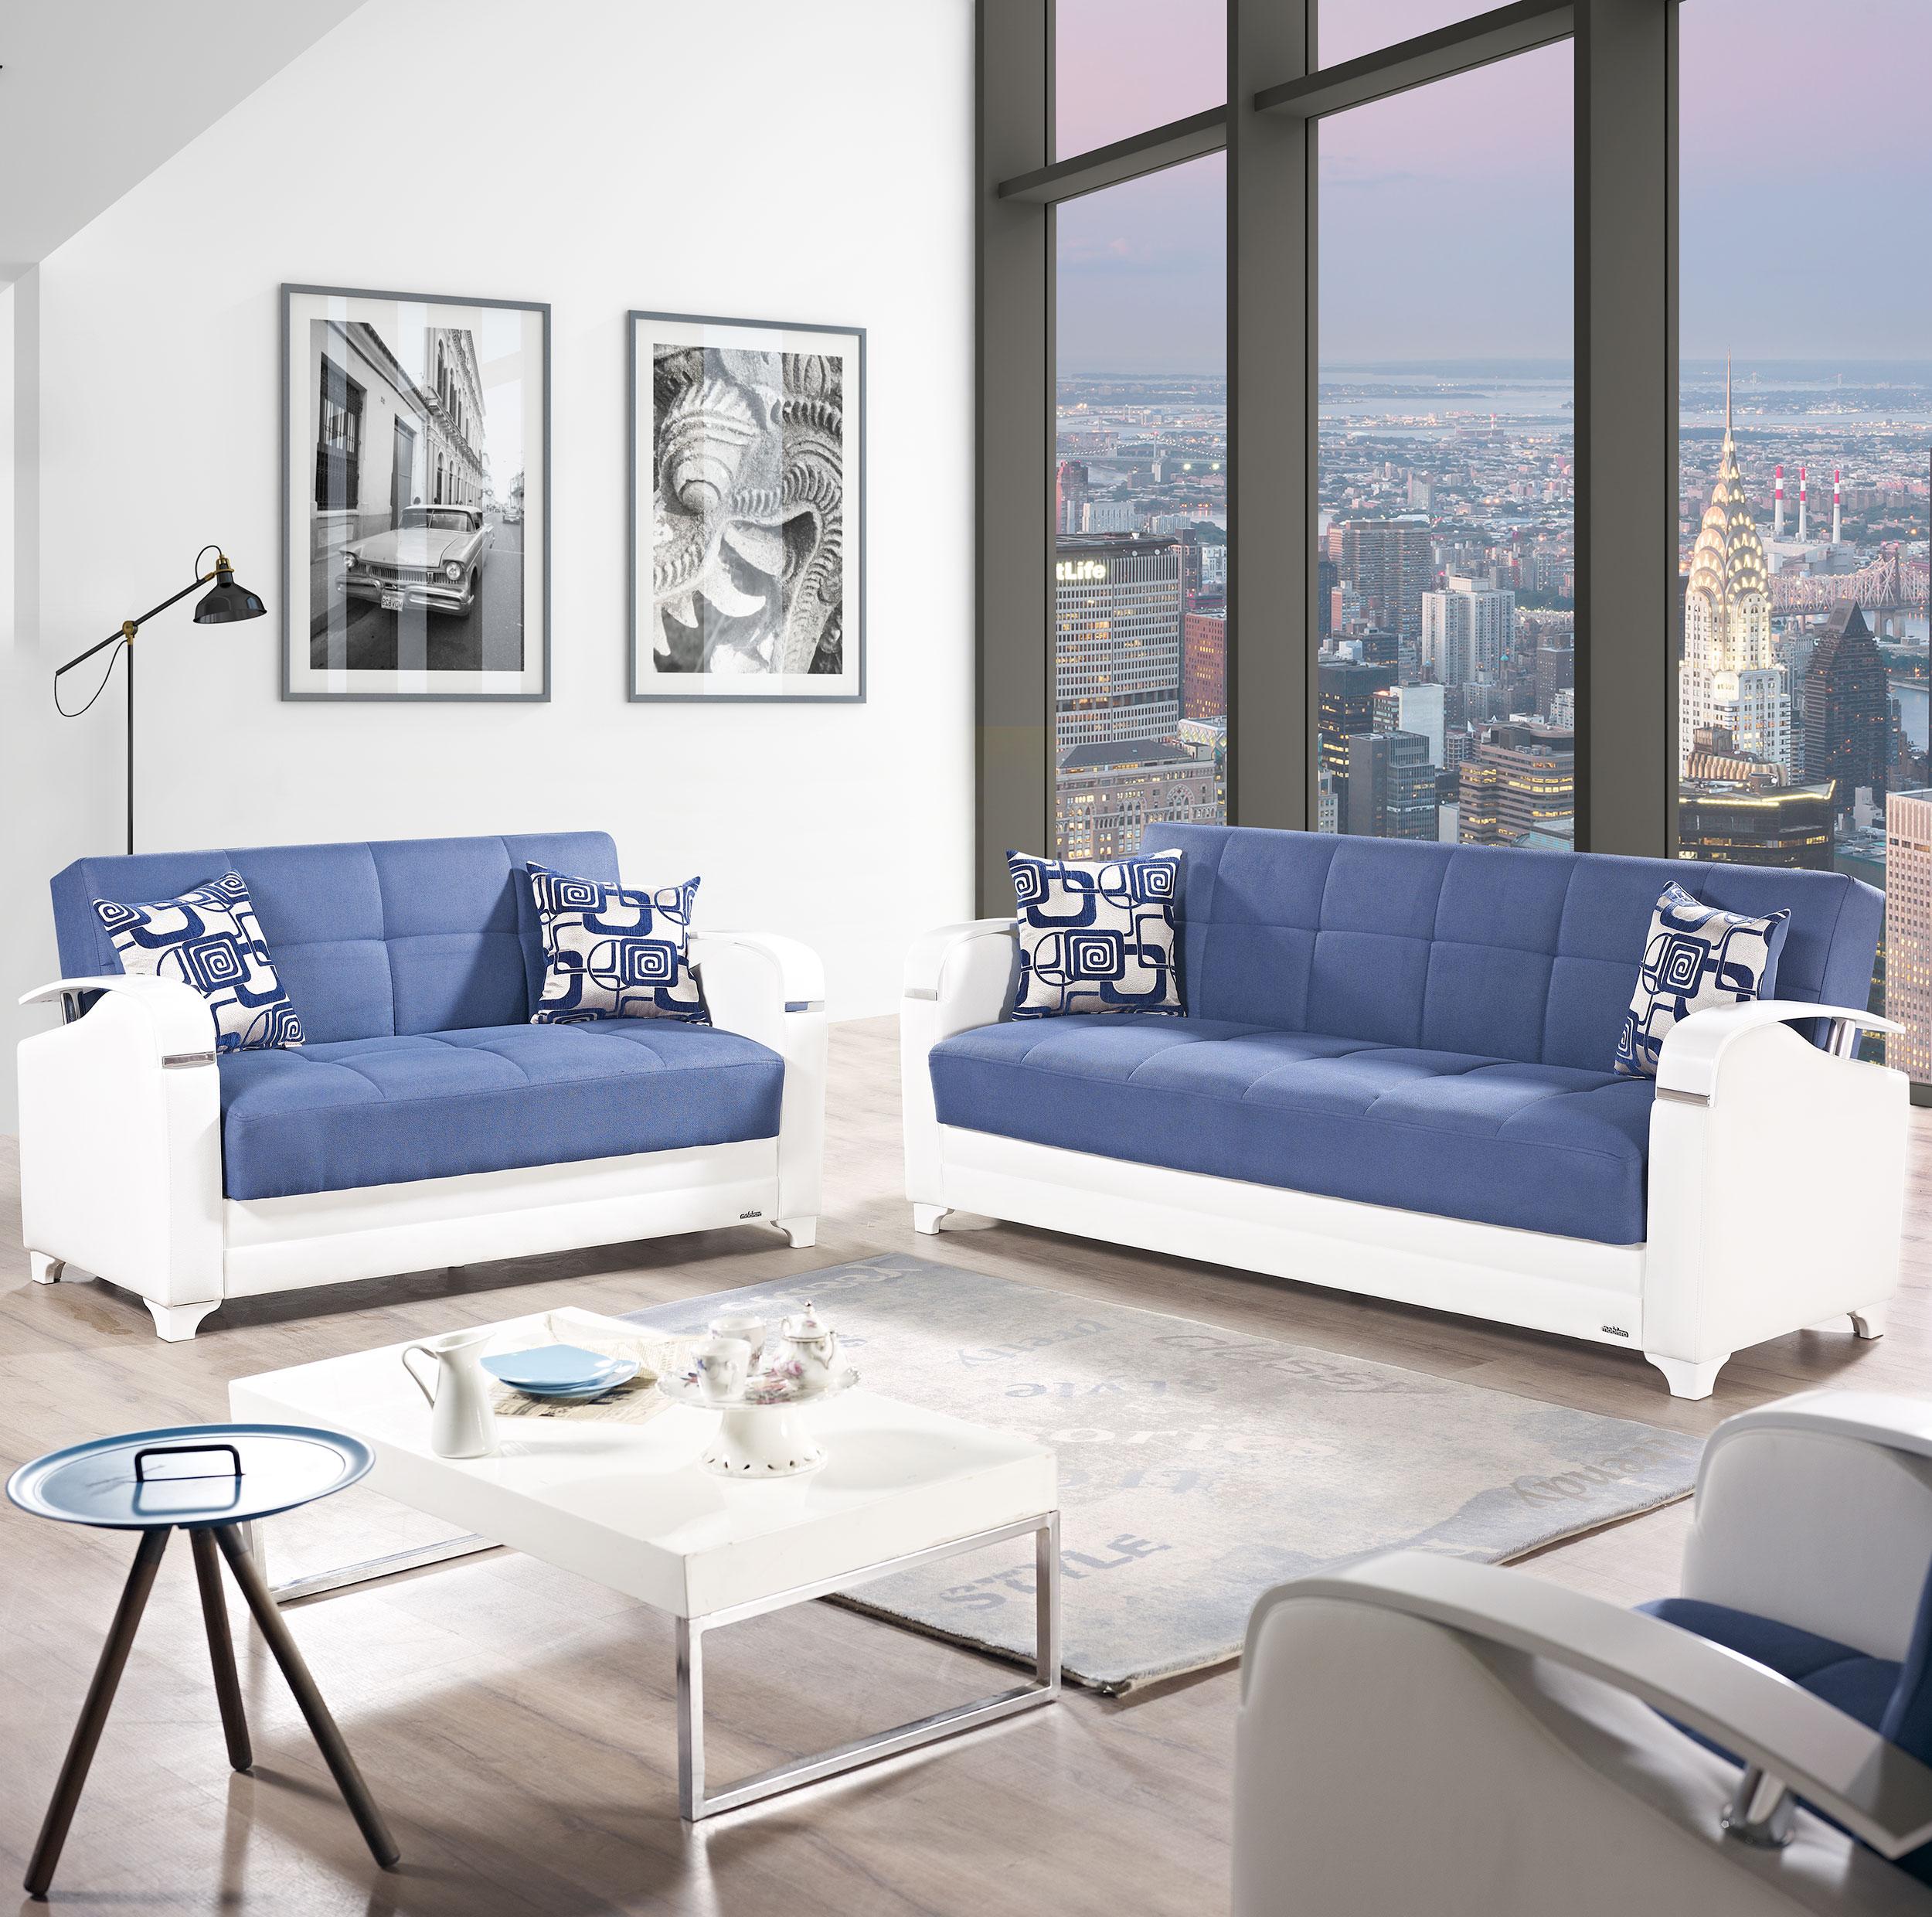 Etro Vintage Navy Blue Fabric Sofa Bed By Mobista (Mobista)